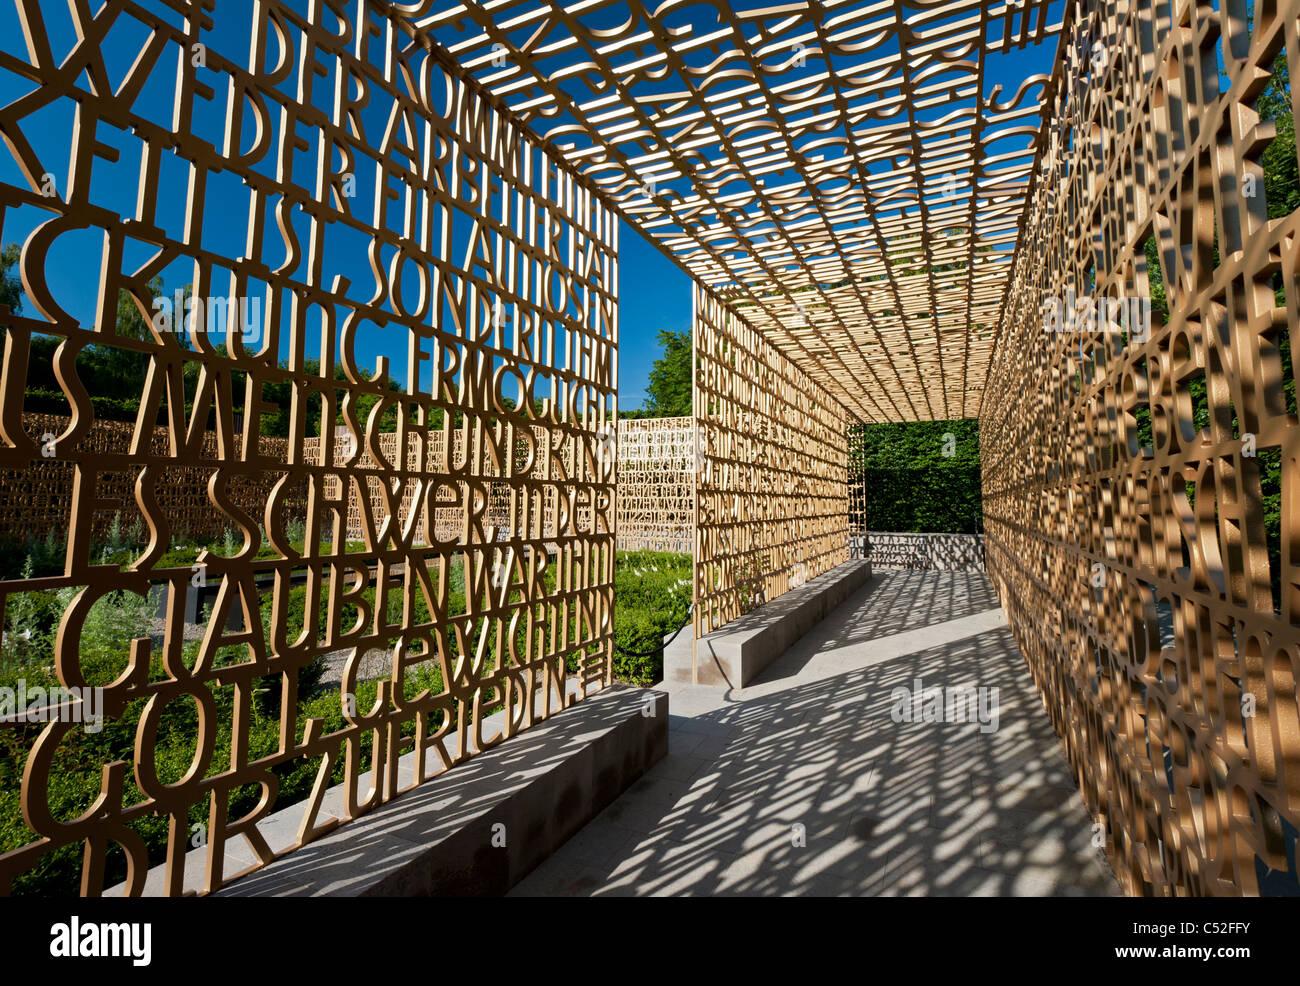 The Christian Garden at Garten der Welt in Marzahn district of Berlin Germany - Stock Image